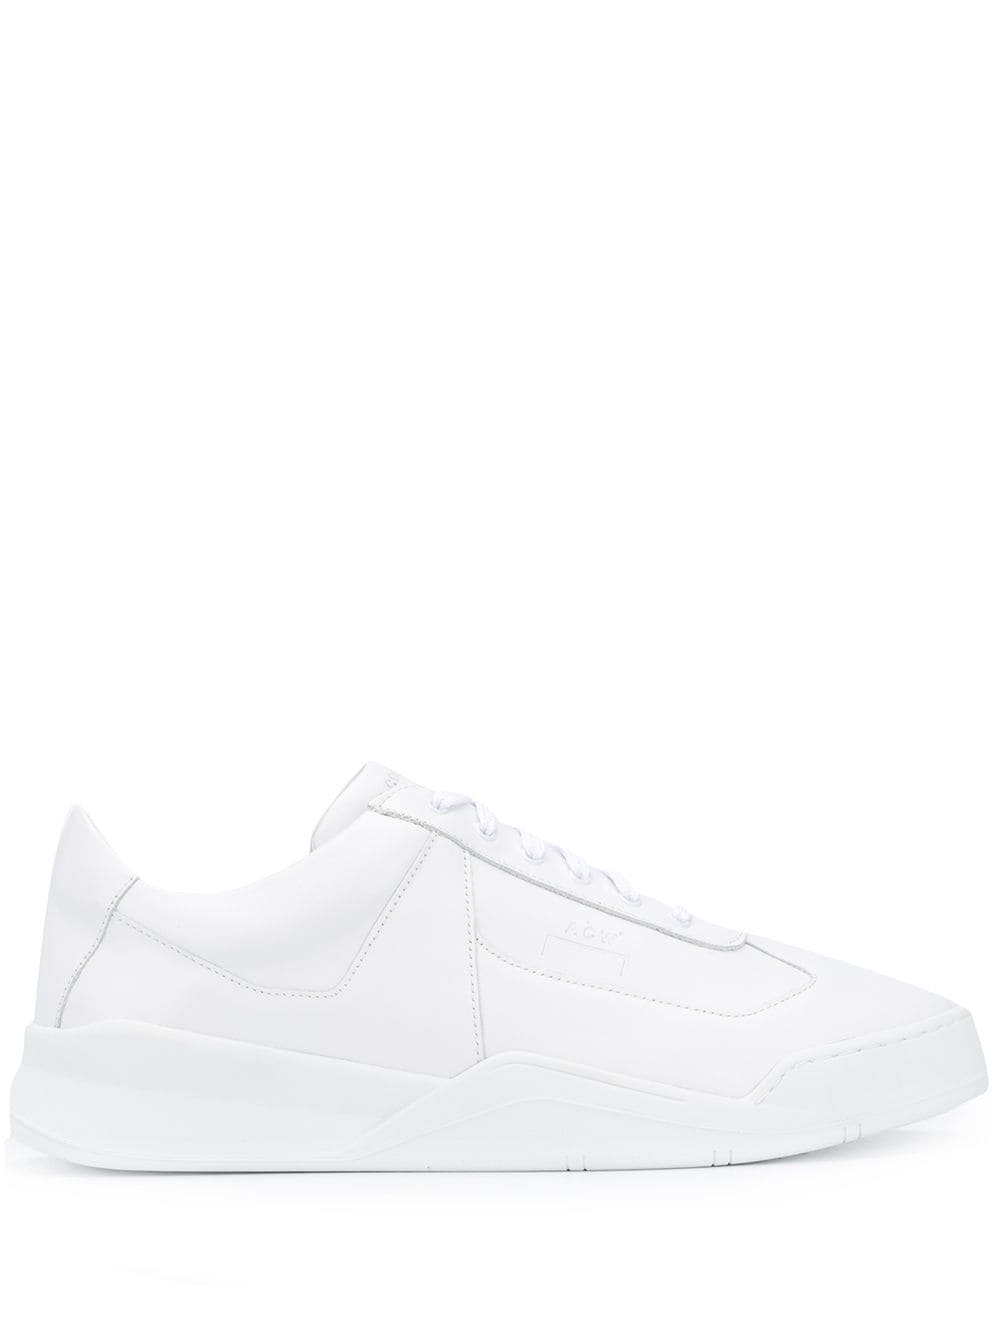 Shard Lo Sneakers